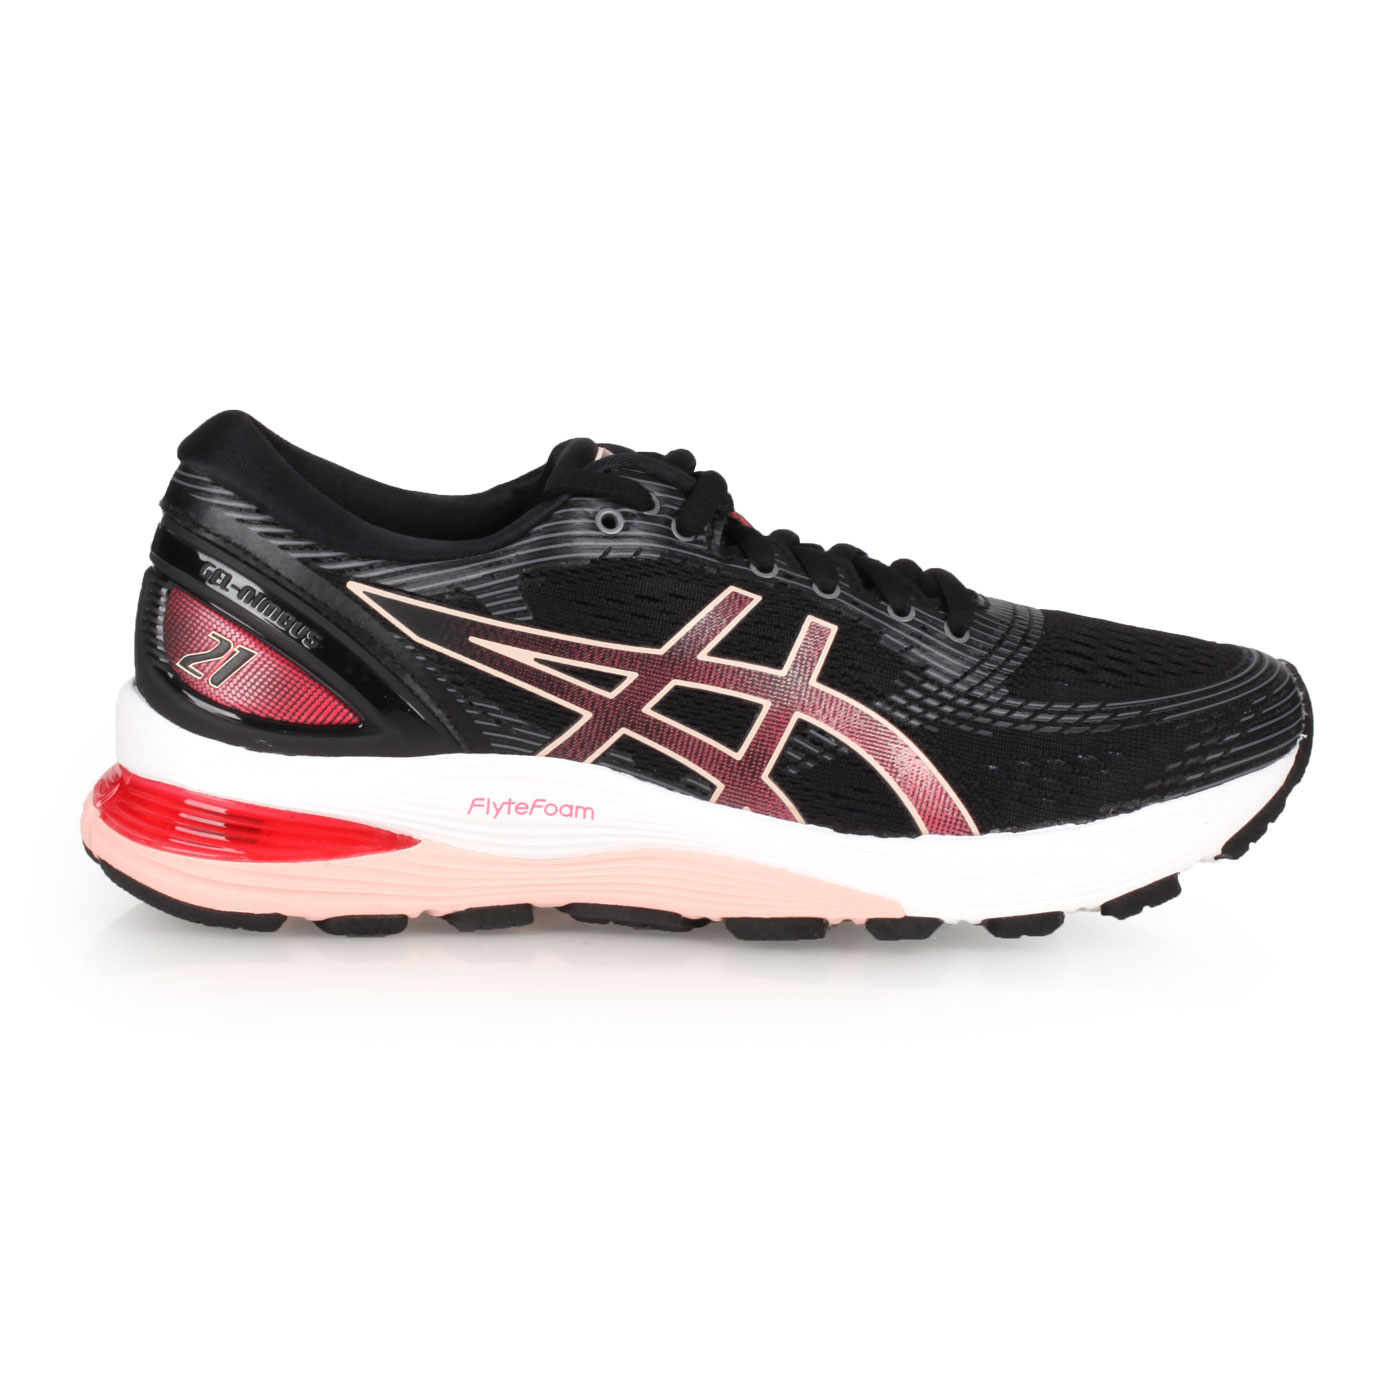 ASICS 女款慢跑鞋  @GEL-NIMBUS 21@1012A156-002